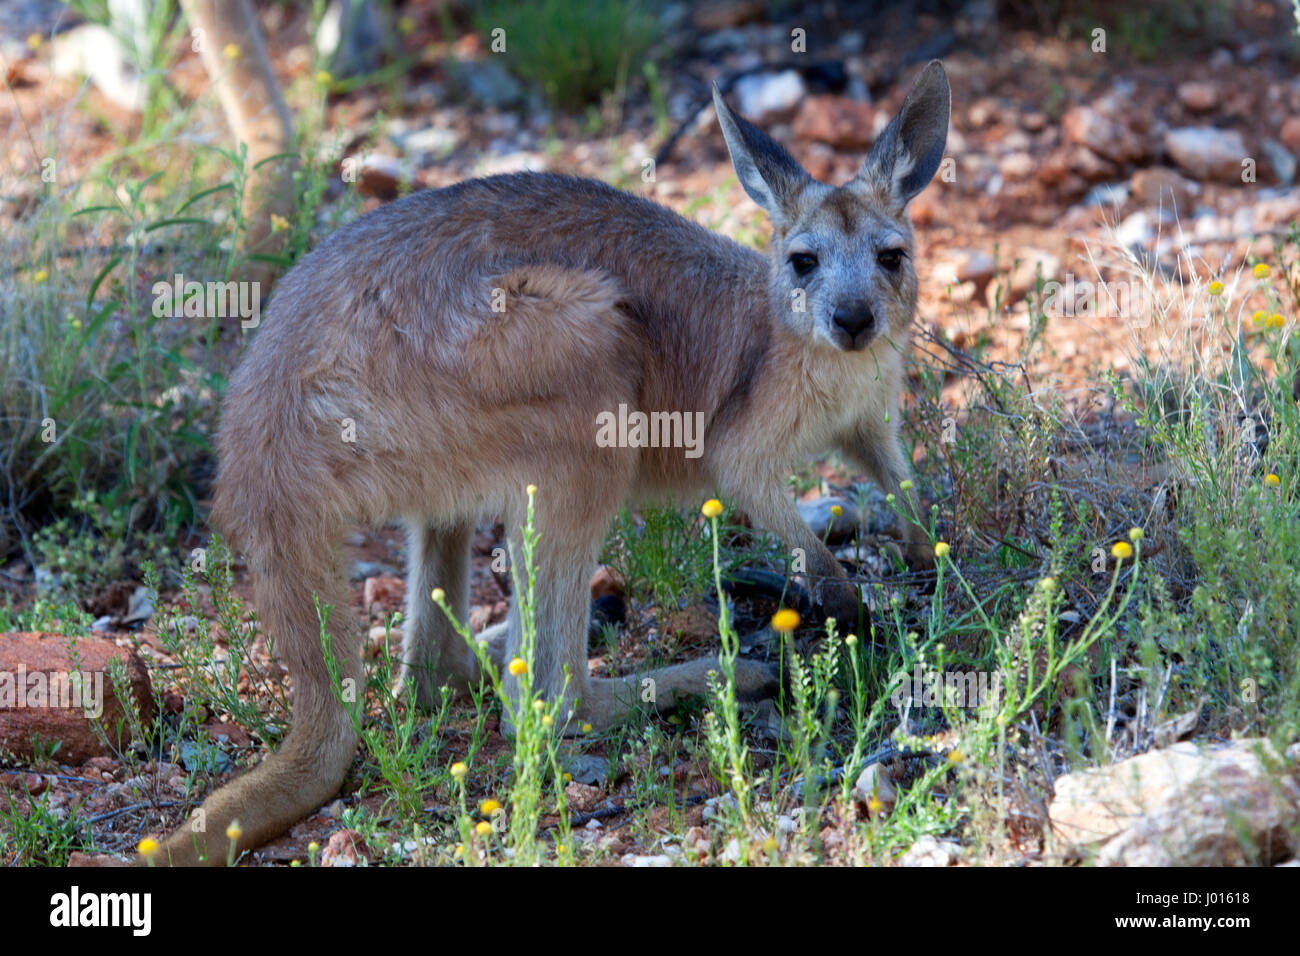 A Young Red Kangaroo (Macropus rufus), in Northern Territory, Australia - Stock Image